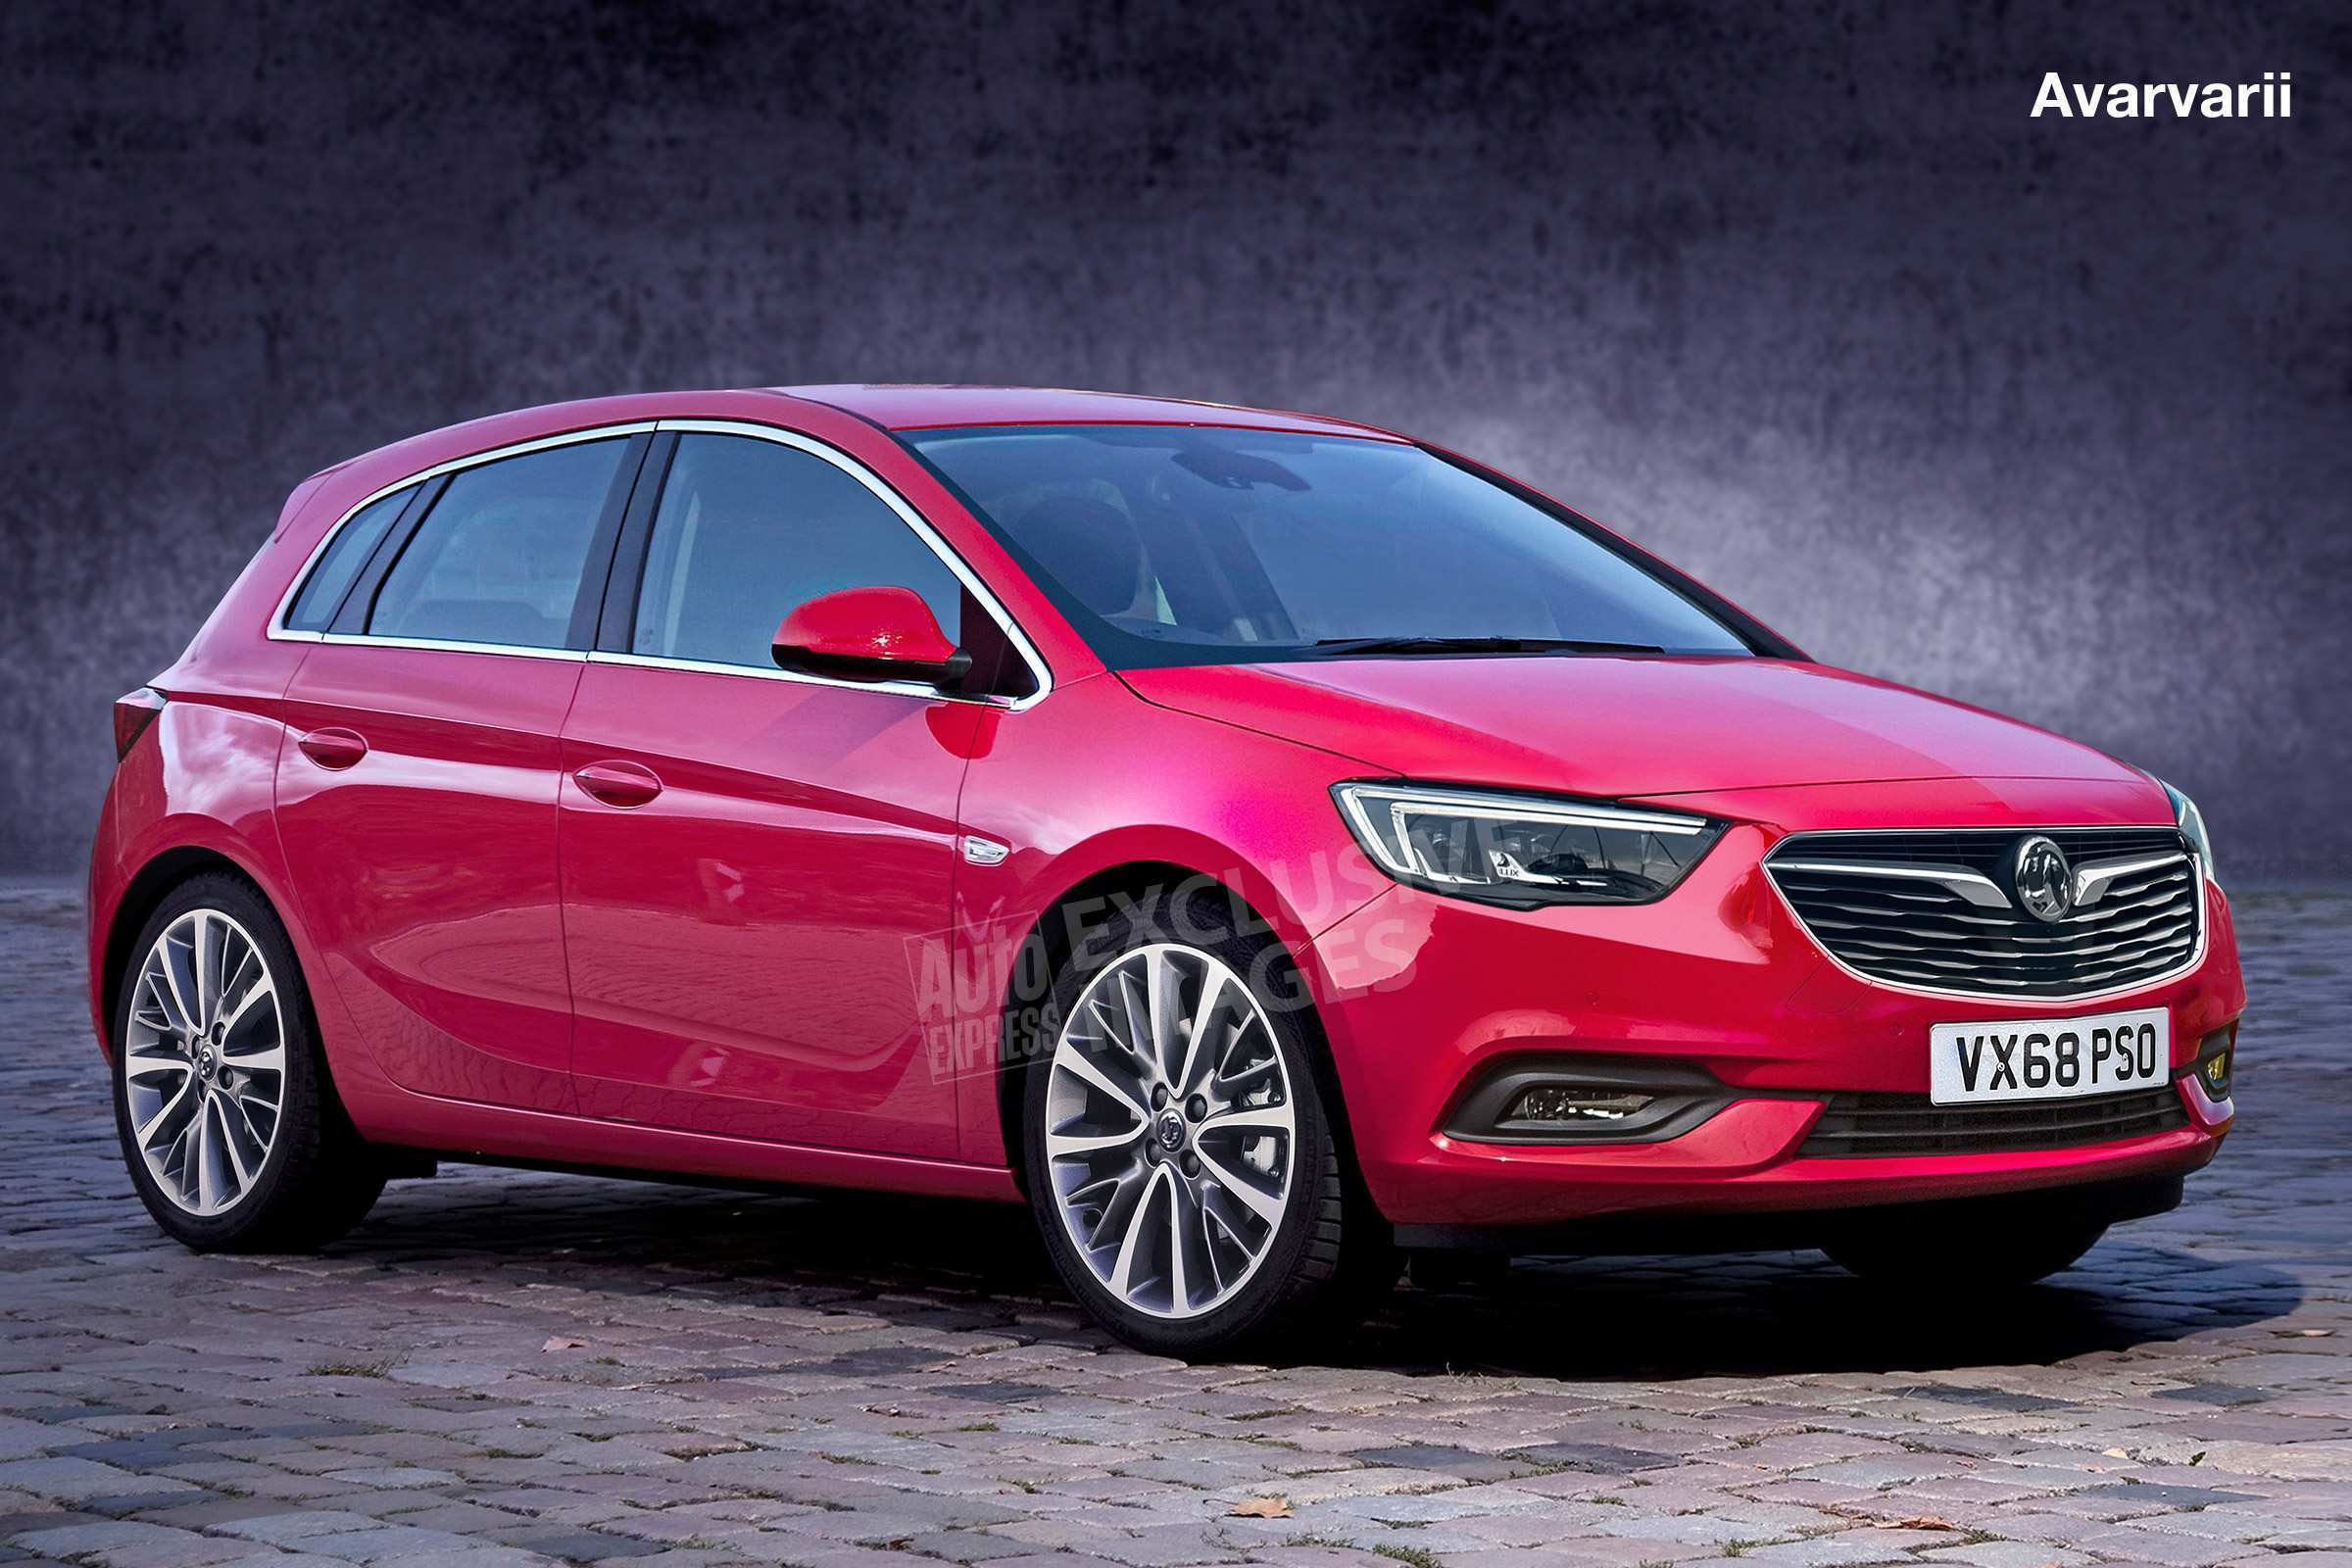 98 The 2020 Opel Corsa 2018 Spy Shoot for 2020 Opel Corsa 2018